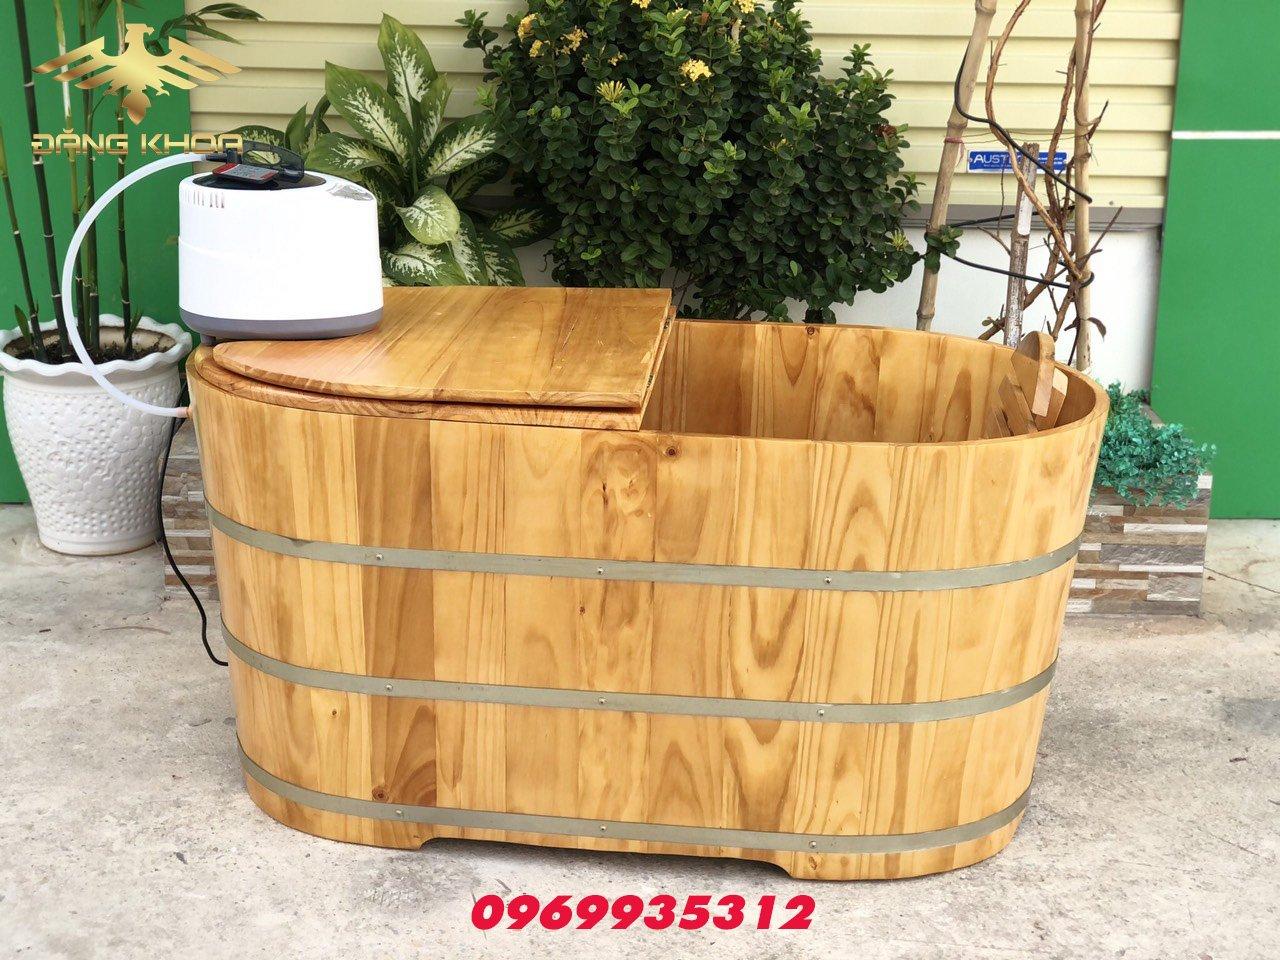 Bồn tắm gỗ tròn 2021